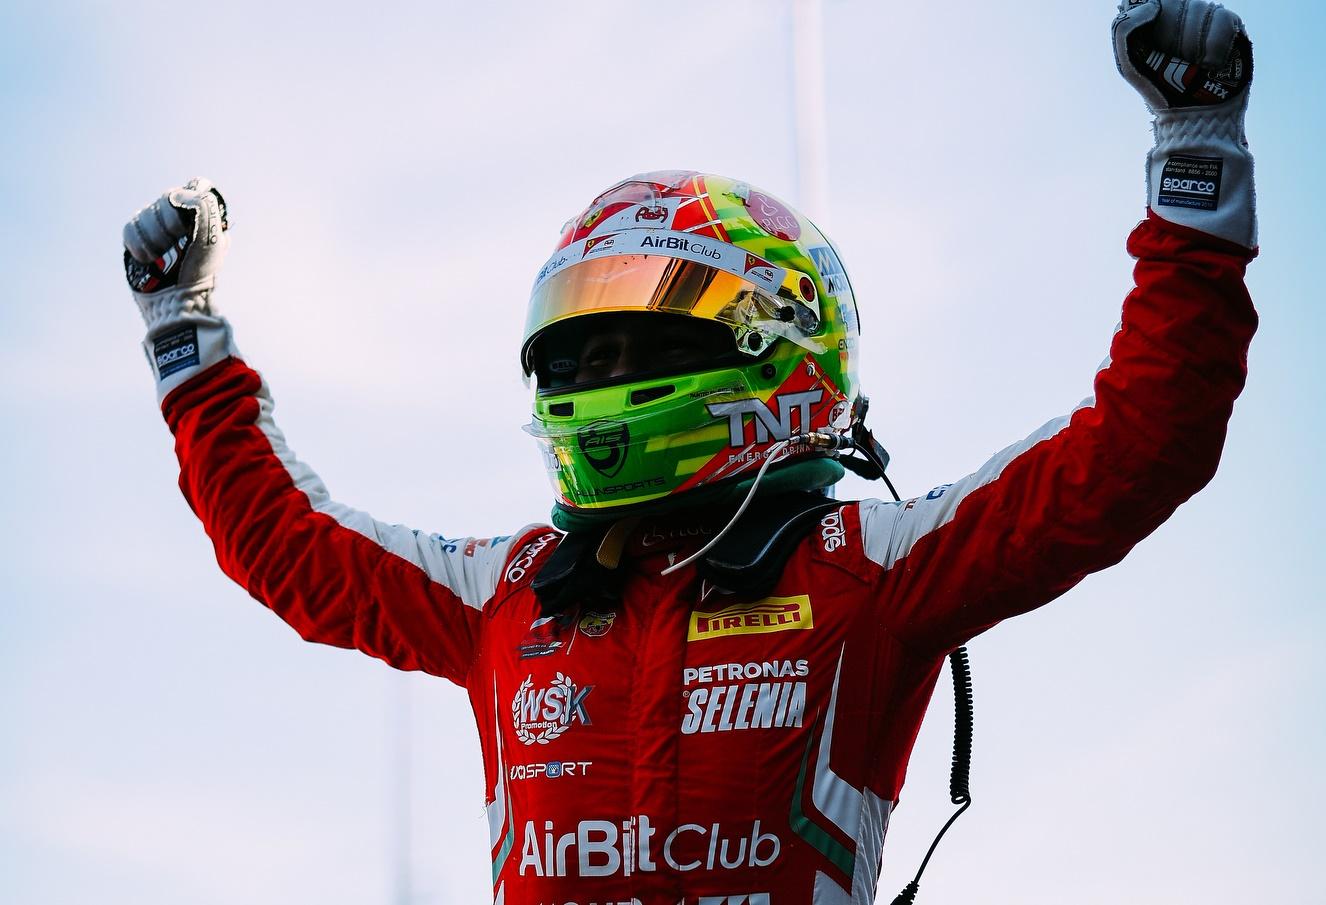 Enzo Fittipaldi, Racingline, racinglinehu, racingline.hu